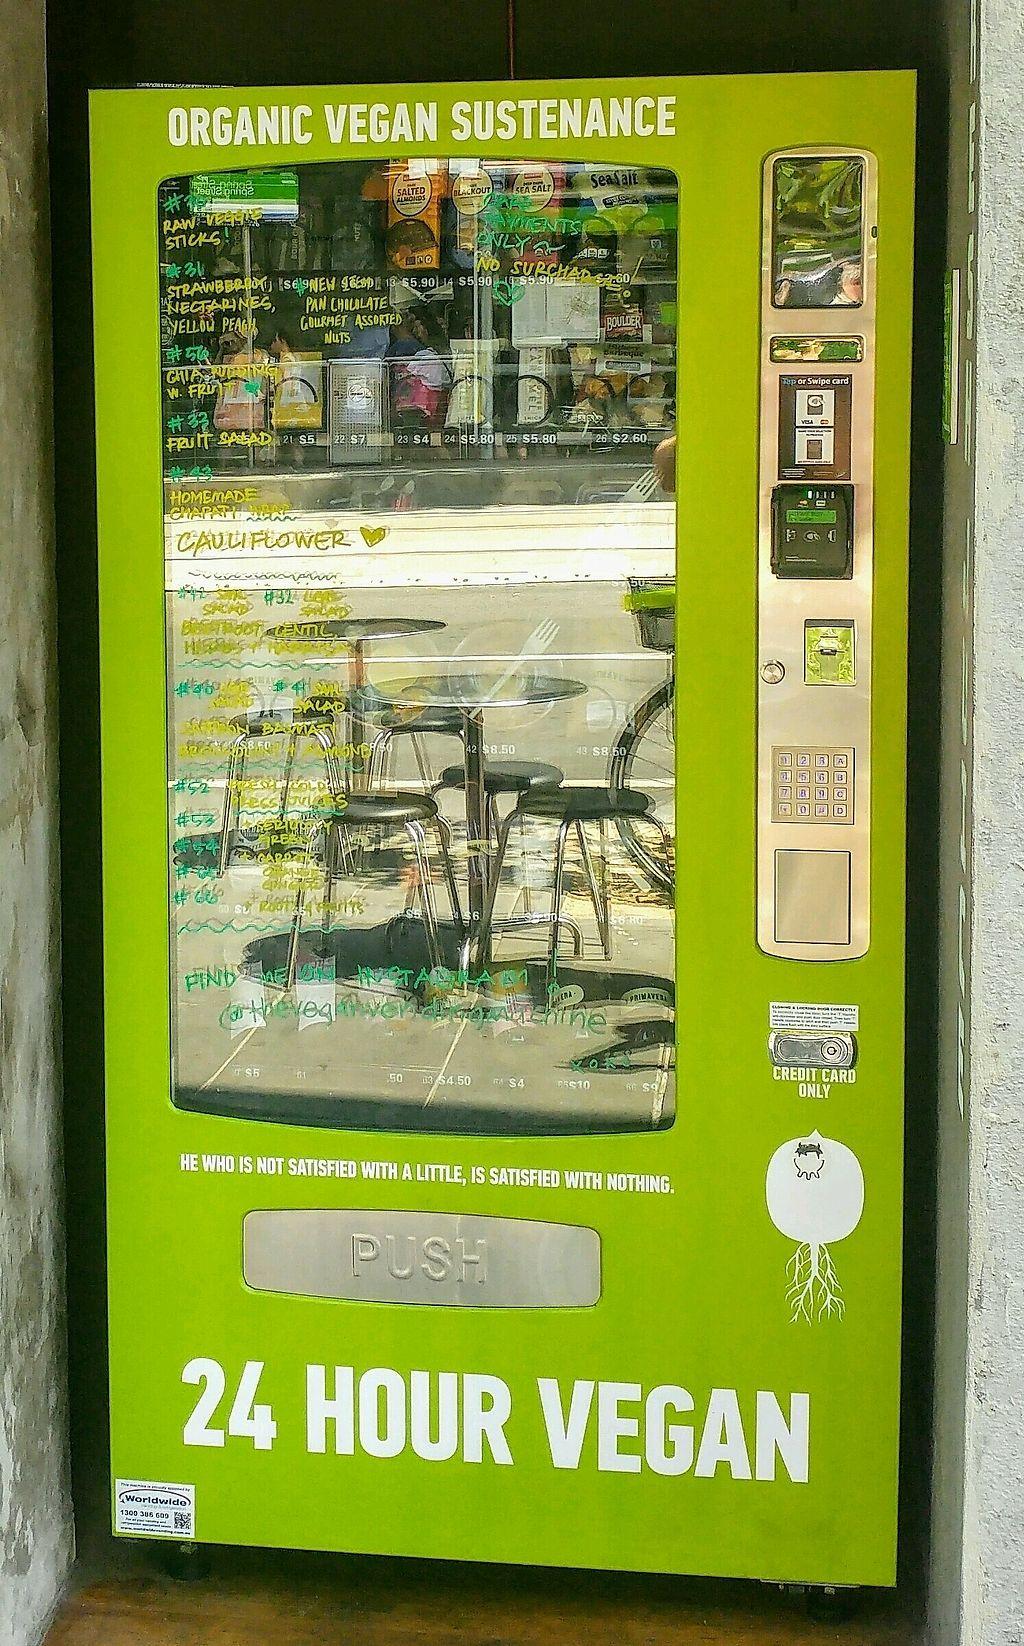 "Photo of 24 Hour Vegan Vending Machine  by <a href=""/members/profile/verbosity"">verbosity</a> <br/>Vegan Vending Machine <br/> January 26, 2018  - <a href='/contact/abuse/image/106873/350956'>Report</a>"